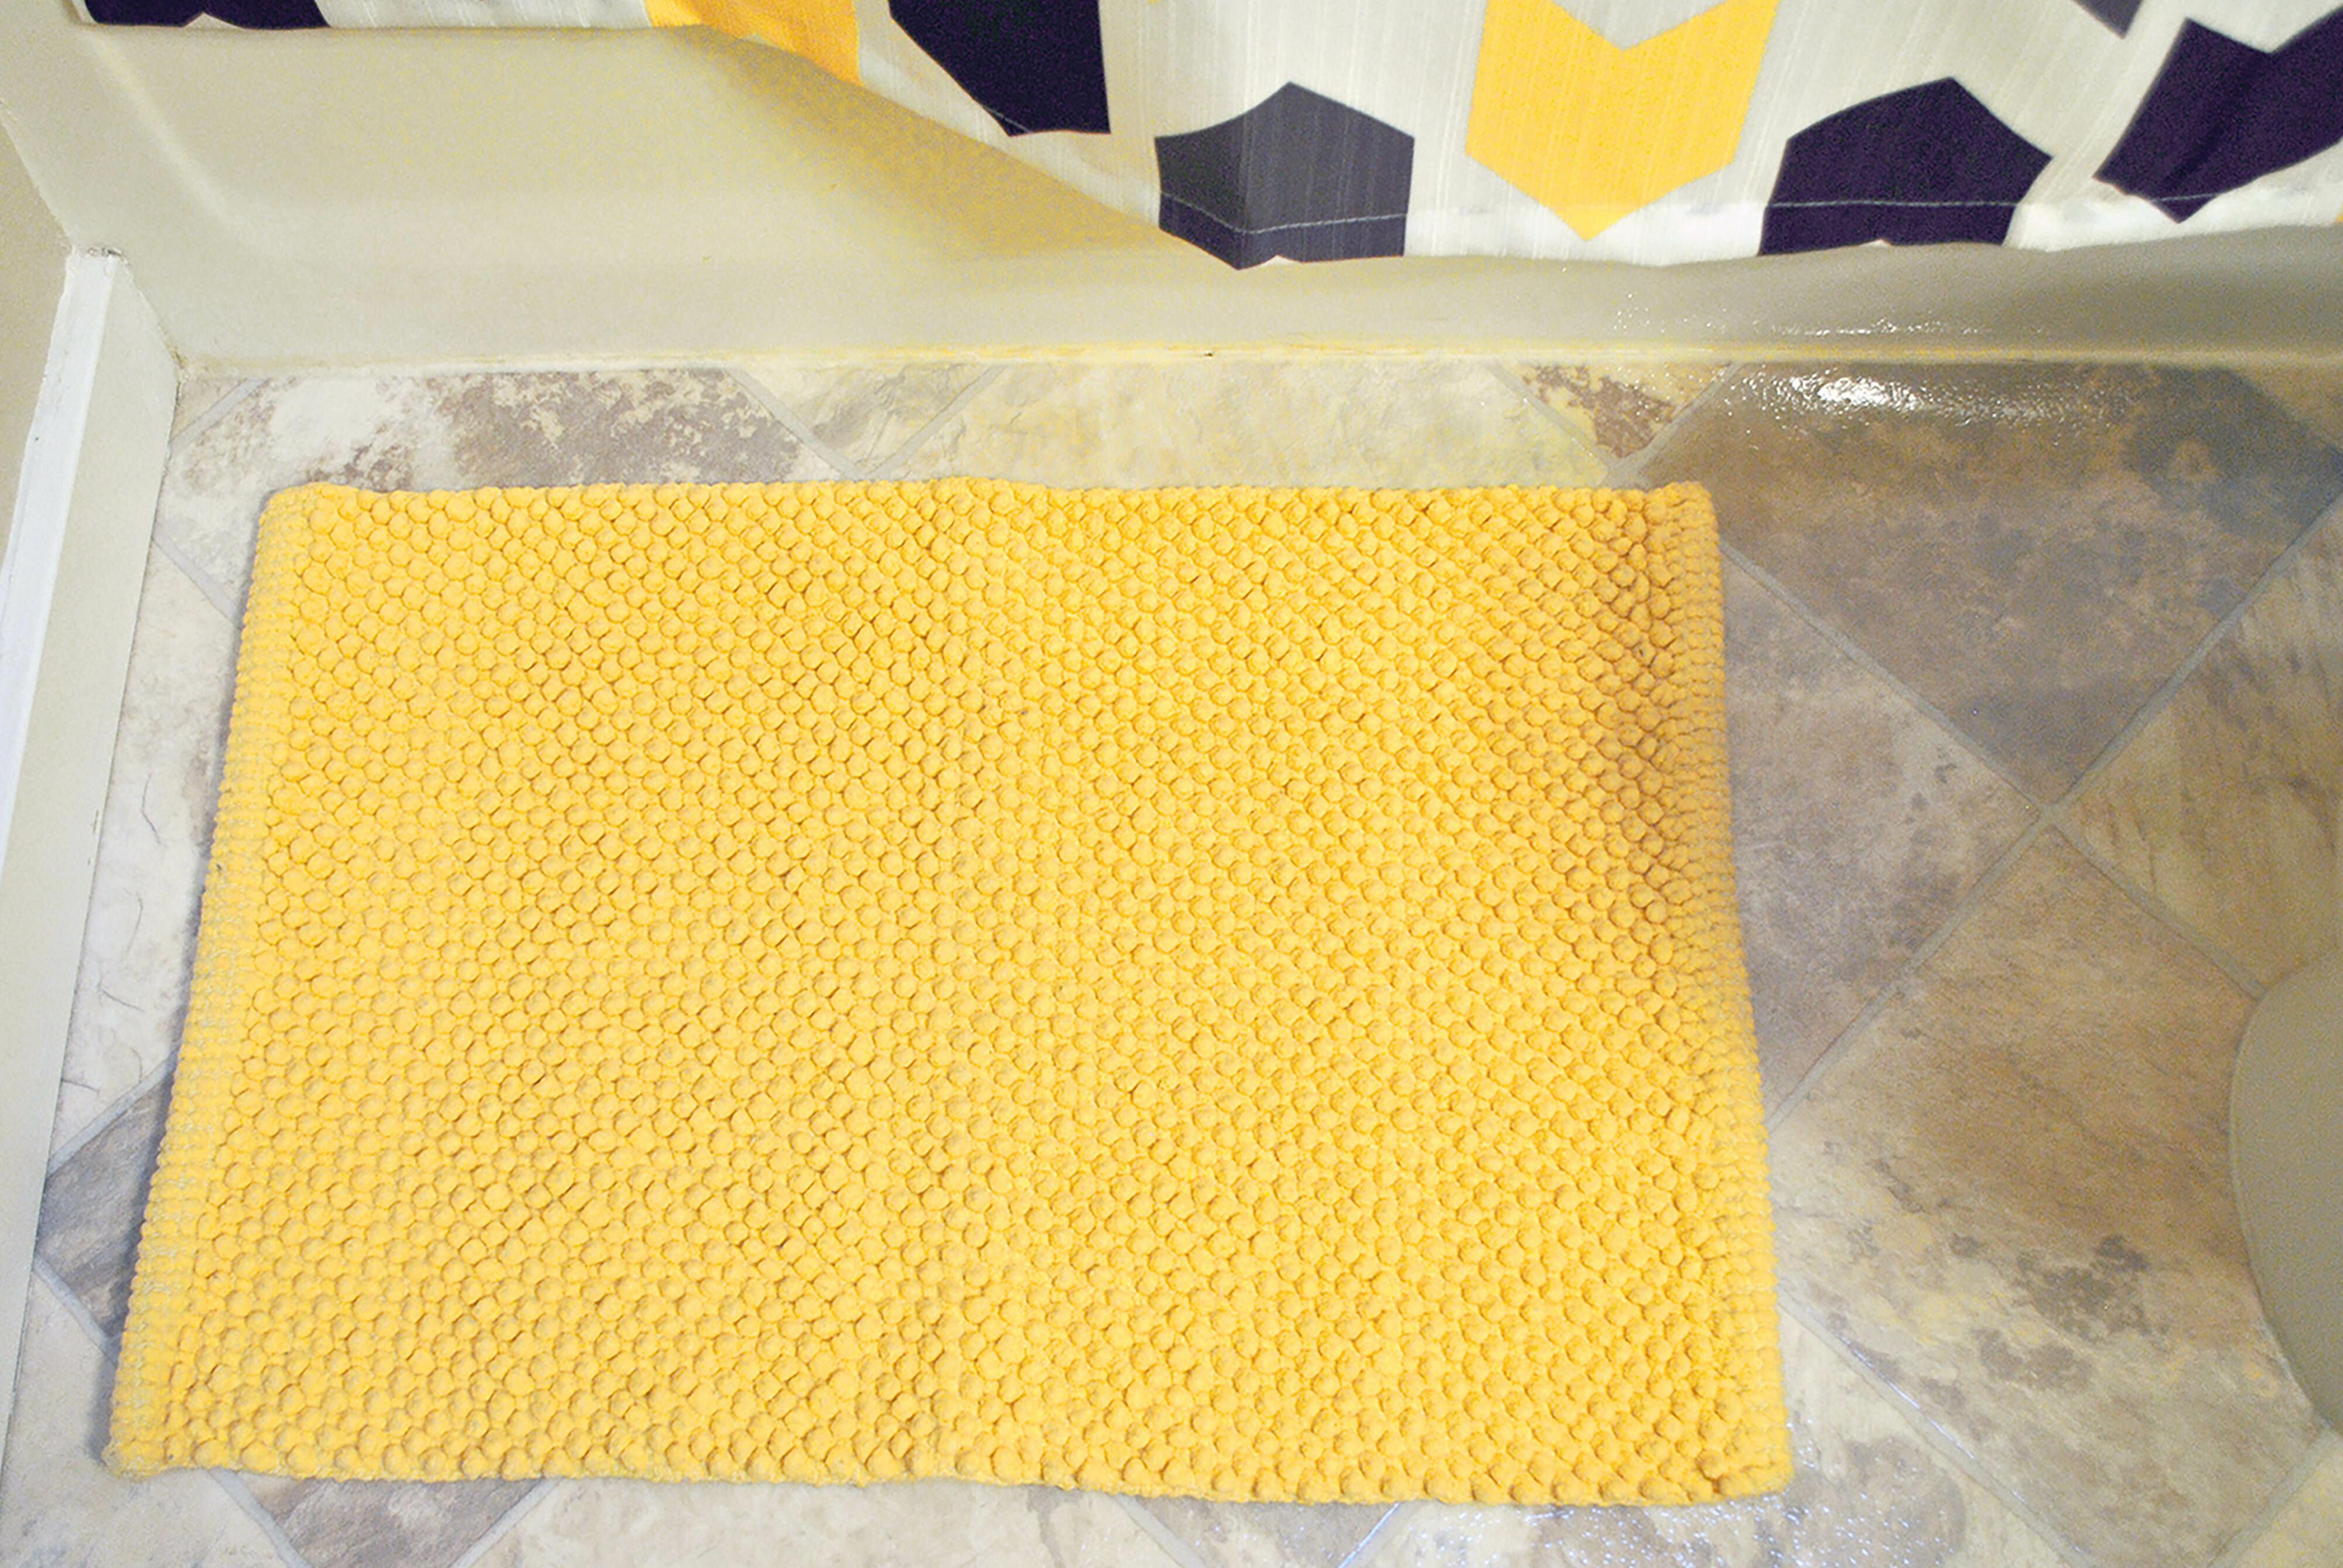 Yellow Gold Bath Rugs Mats Bathrooms You Ll Love In 2021 Wayfair